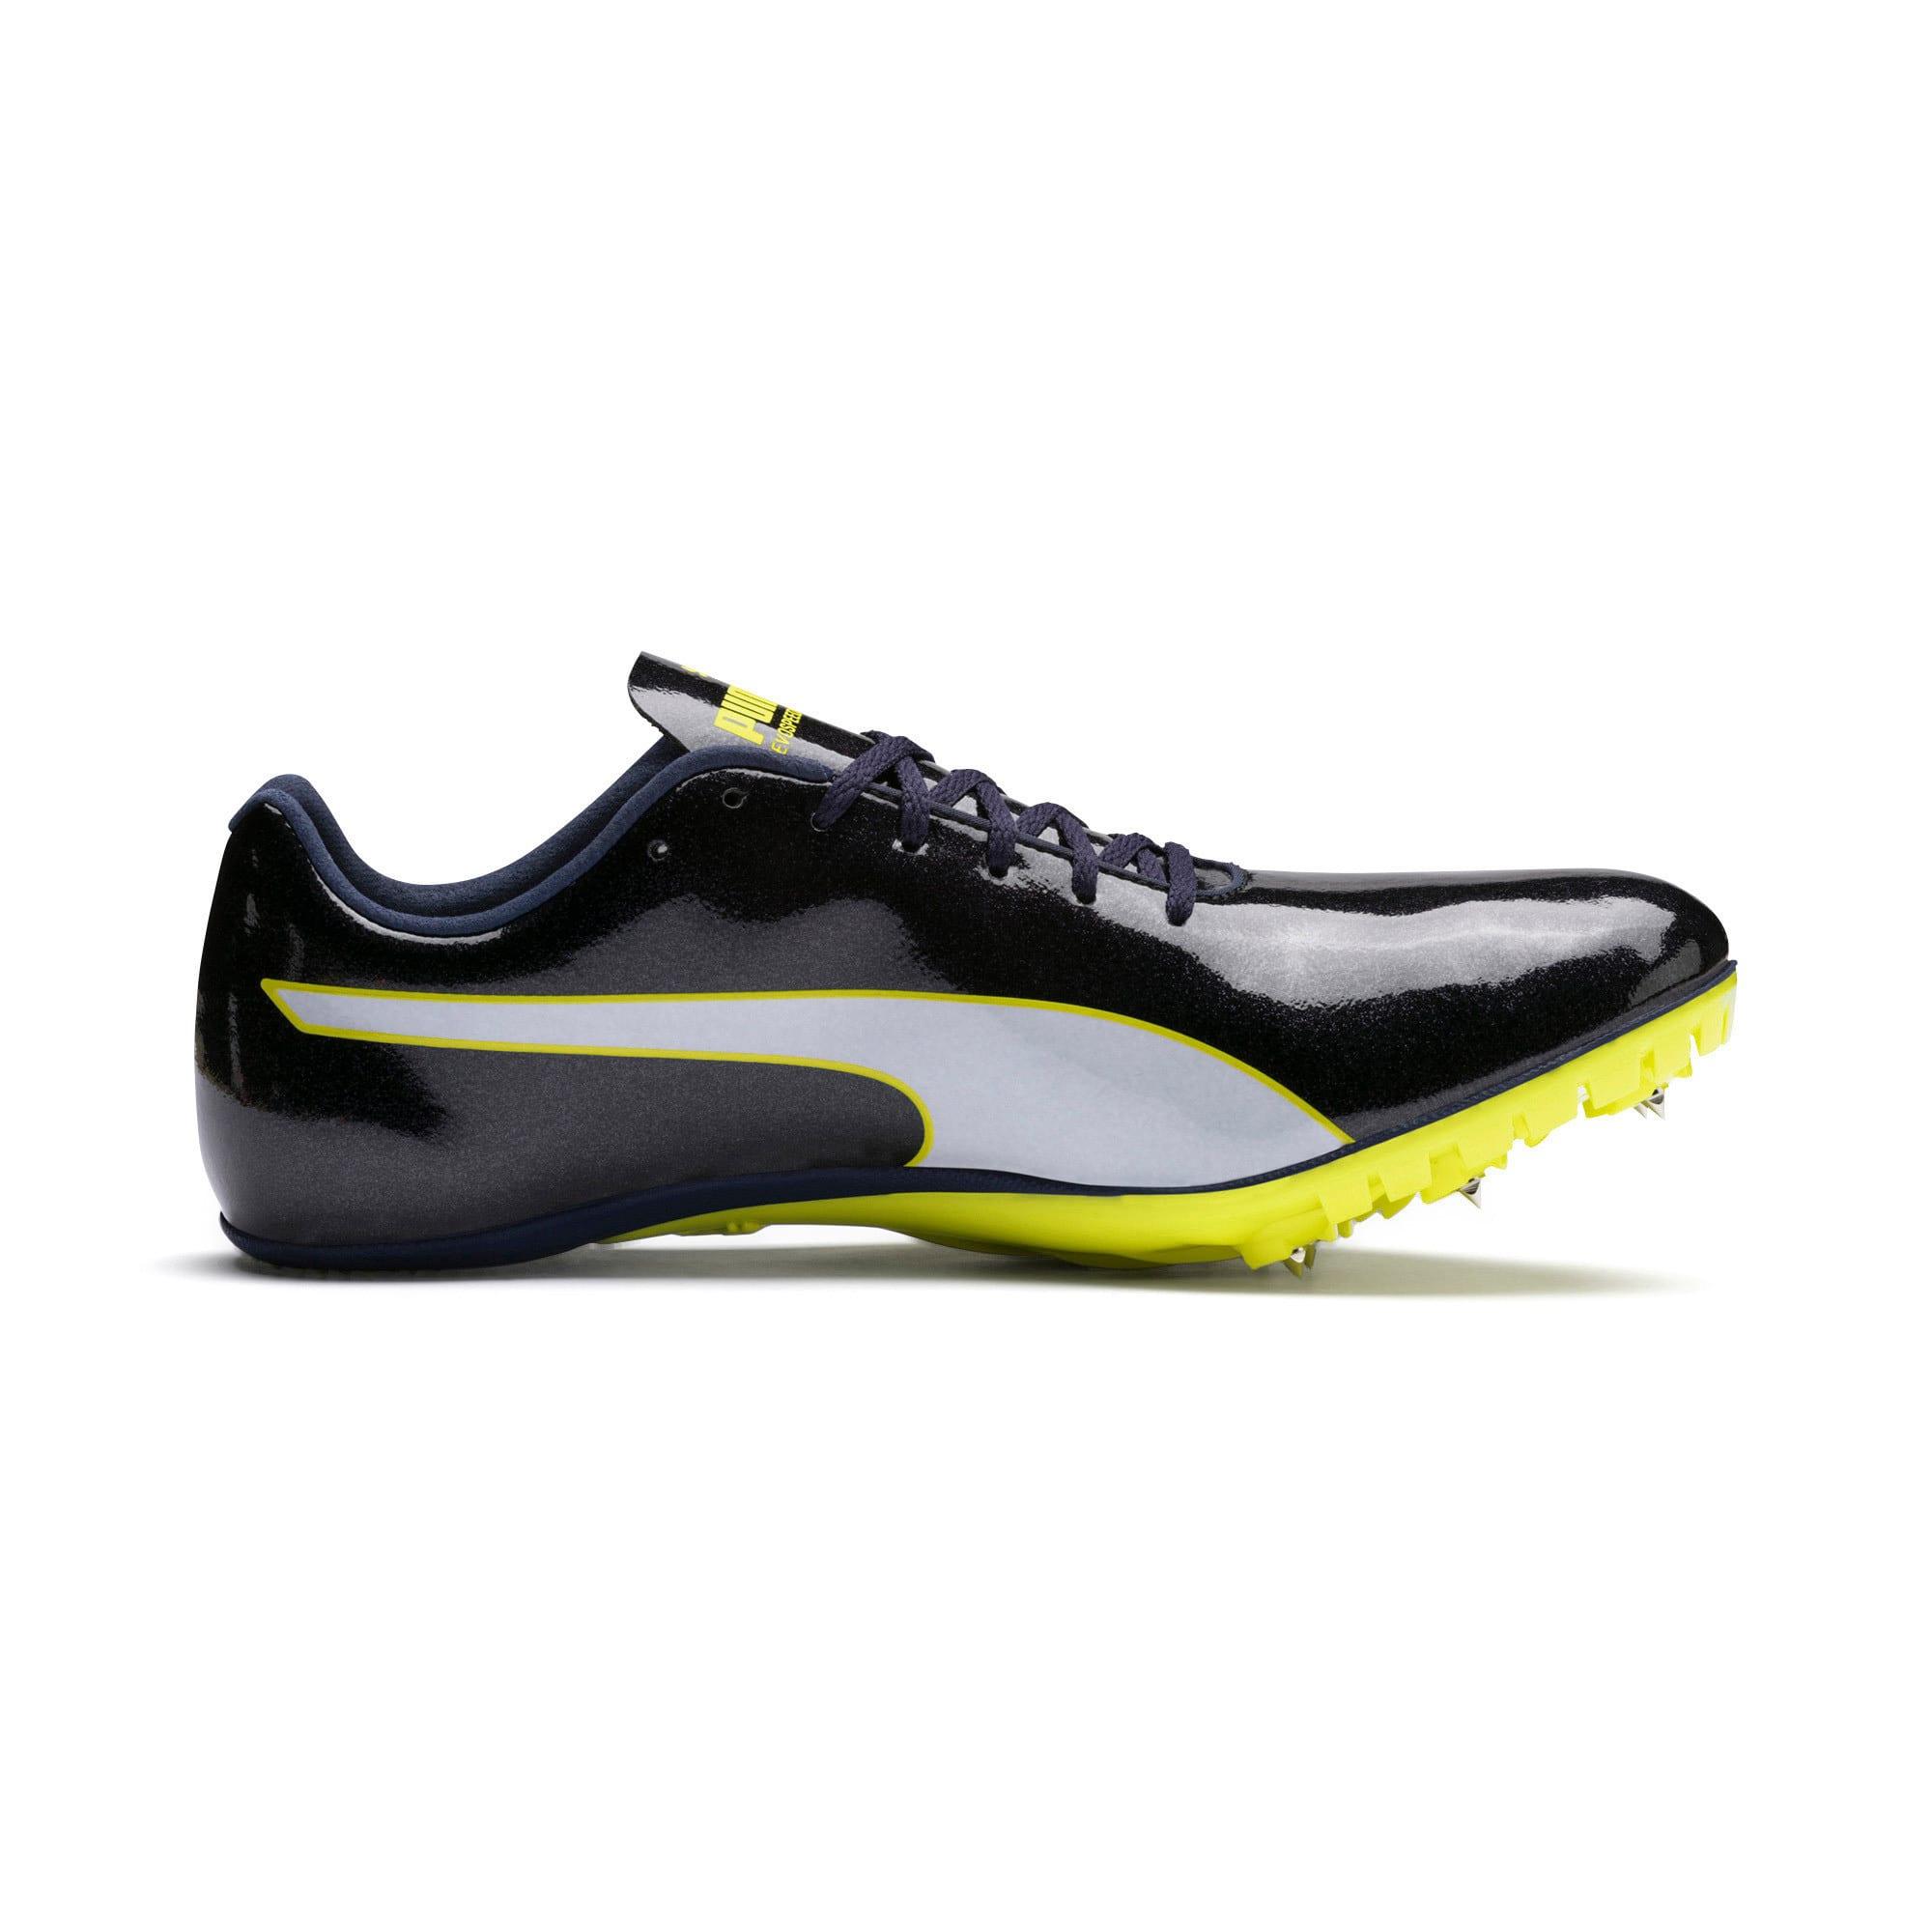 Thumbnail 5 of evoSPEED Sprint 9 Running Shoes, Black-Blazing Yellow-White, medium-IND